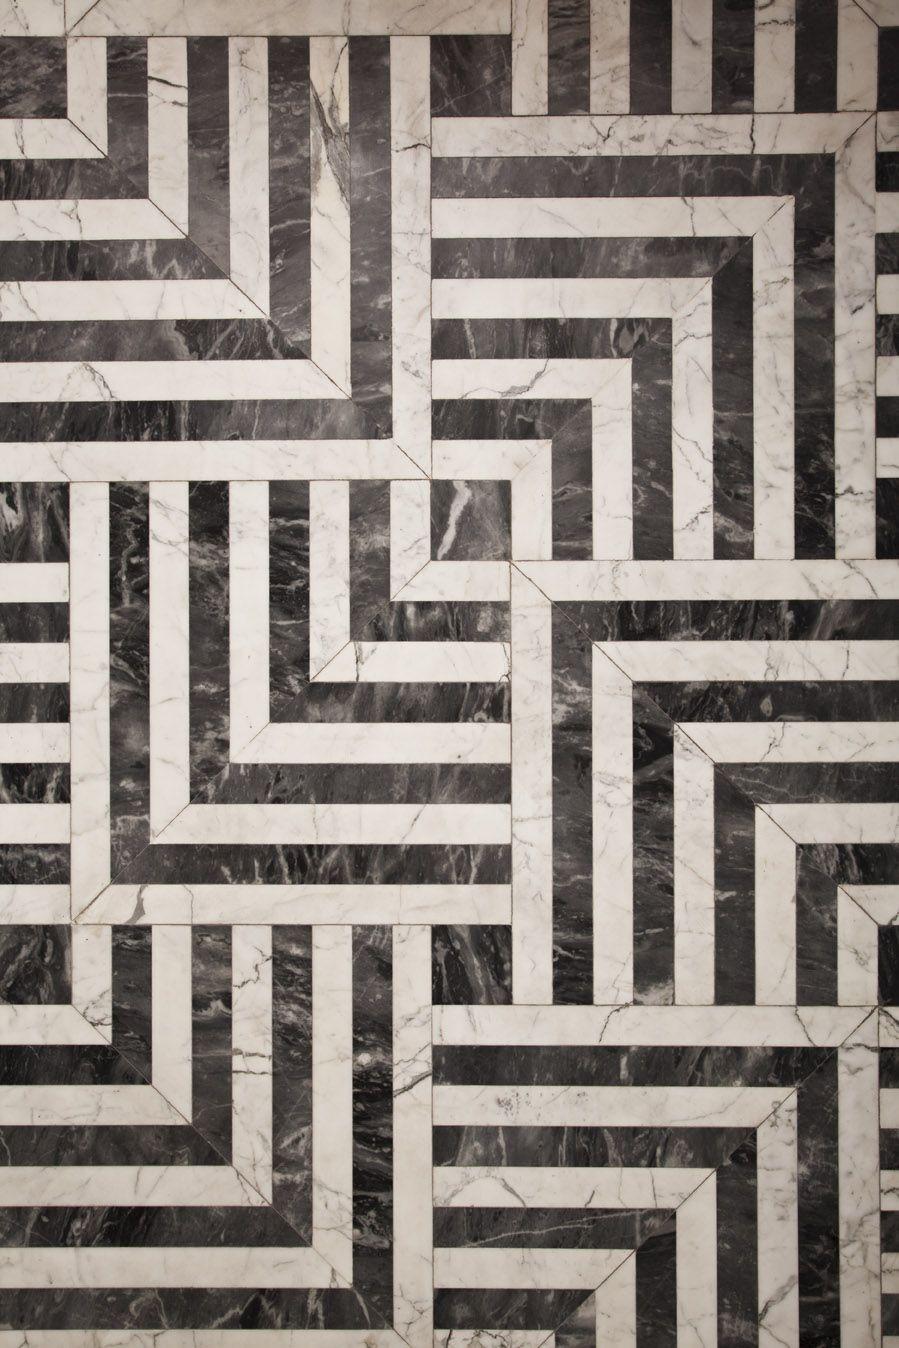 Floor hannasroom kelly wearstler marble floor and floor floor hannasroom floor designtile designmarble dailygadgetfo Choice Image